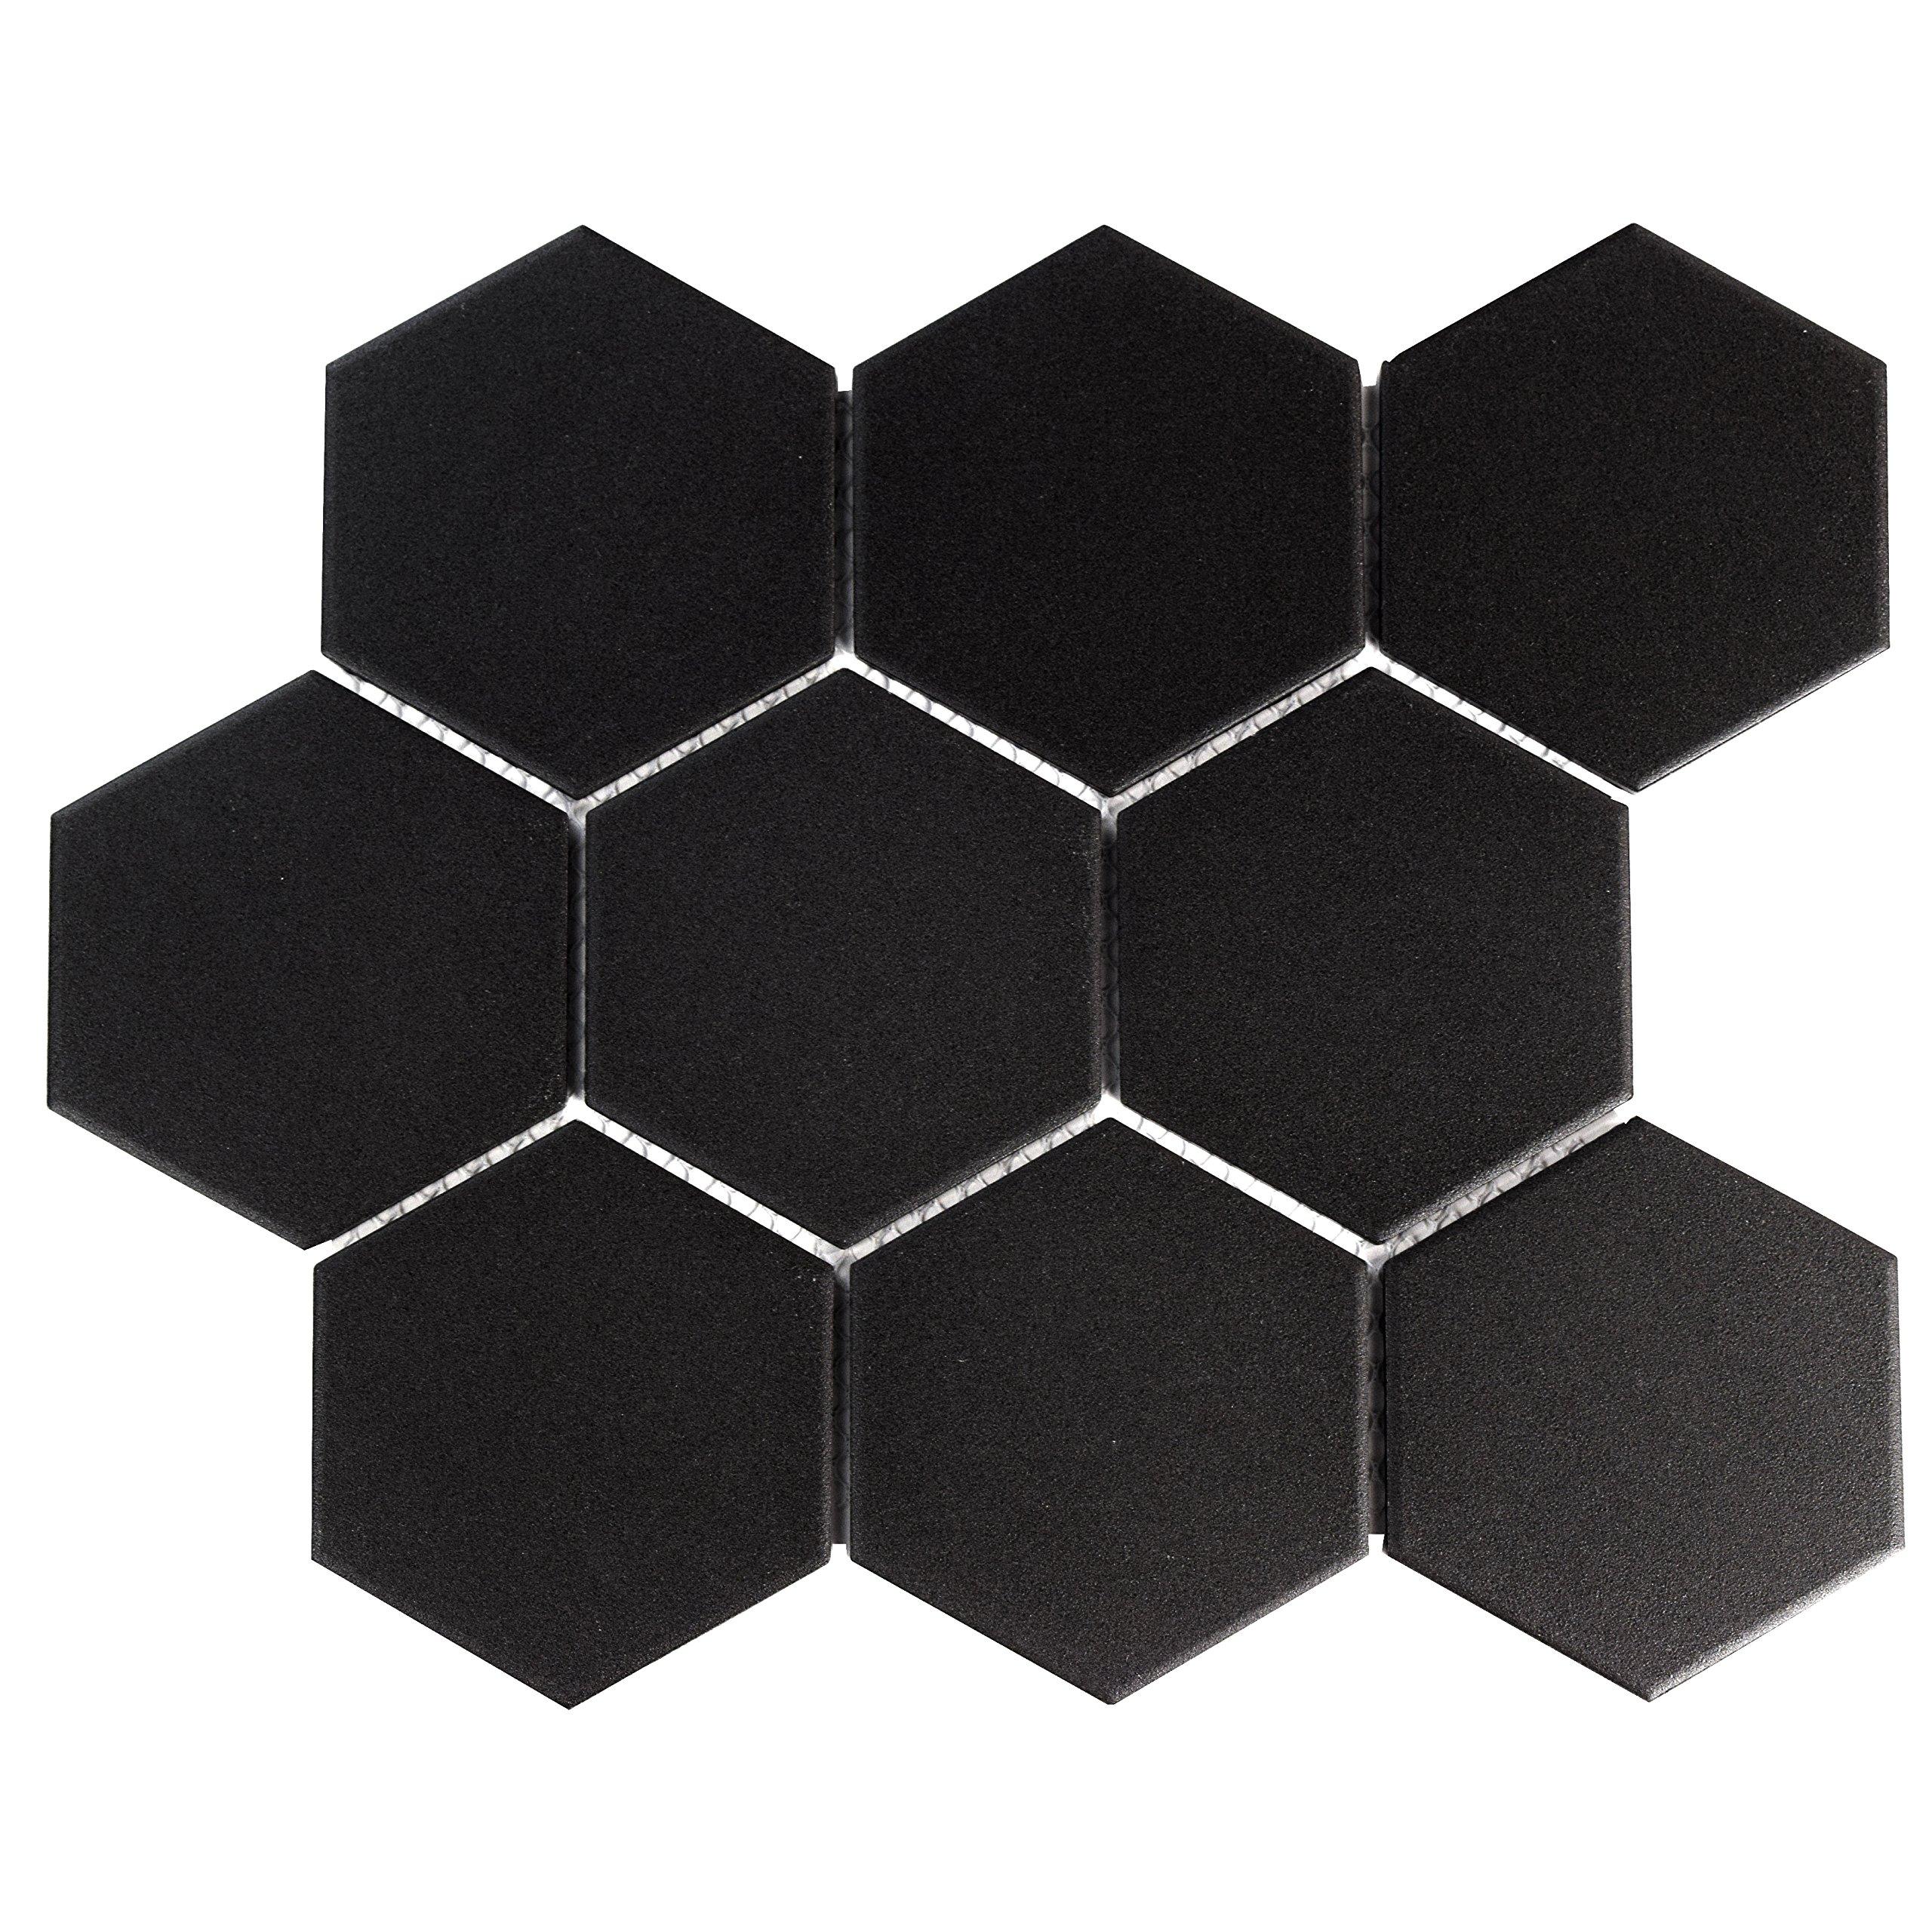 SomerTile FXLG4HBK Antique Super Hex Unglazed Porcelain Mosaic Floor and Wall Tile 10 Piece, 10'' x 11.5'', Black